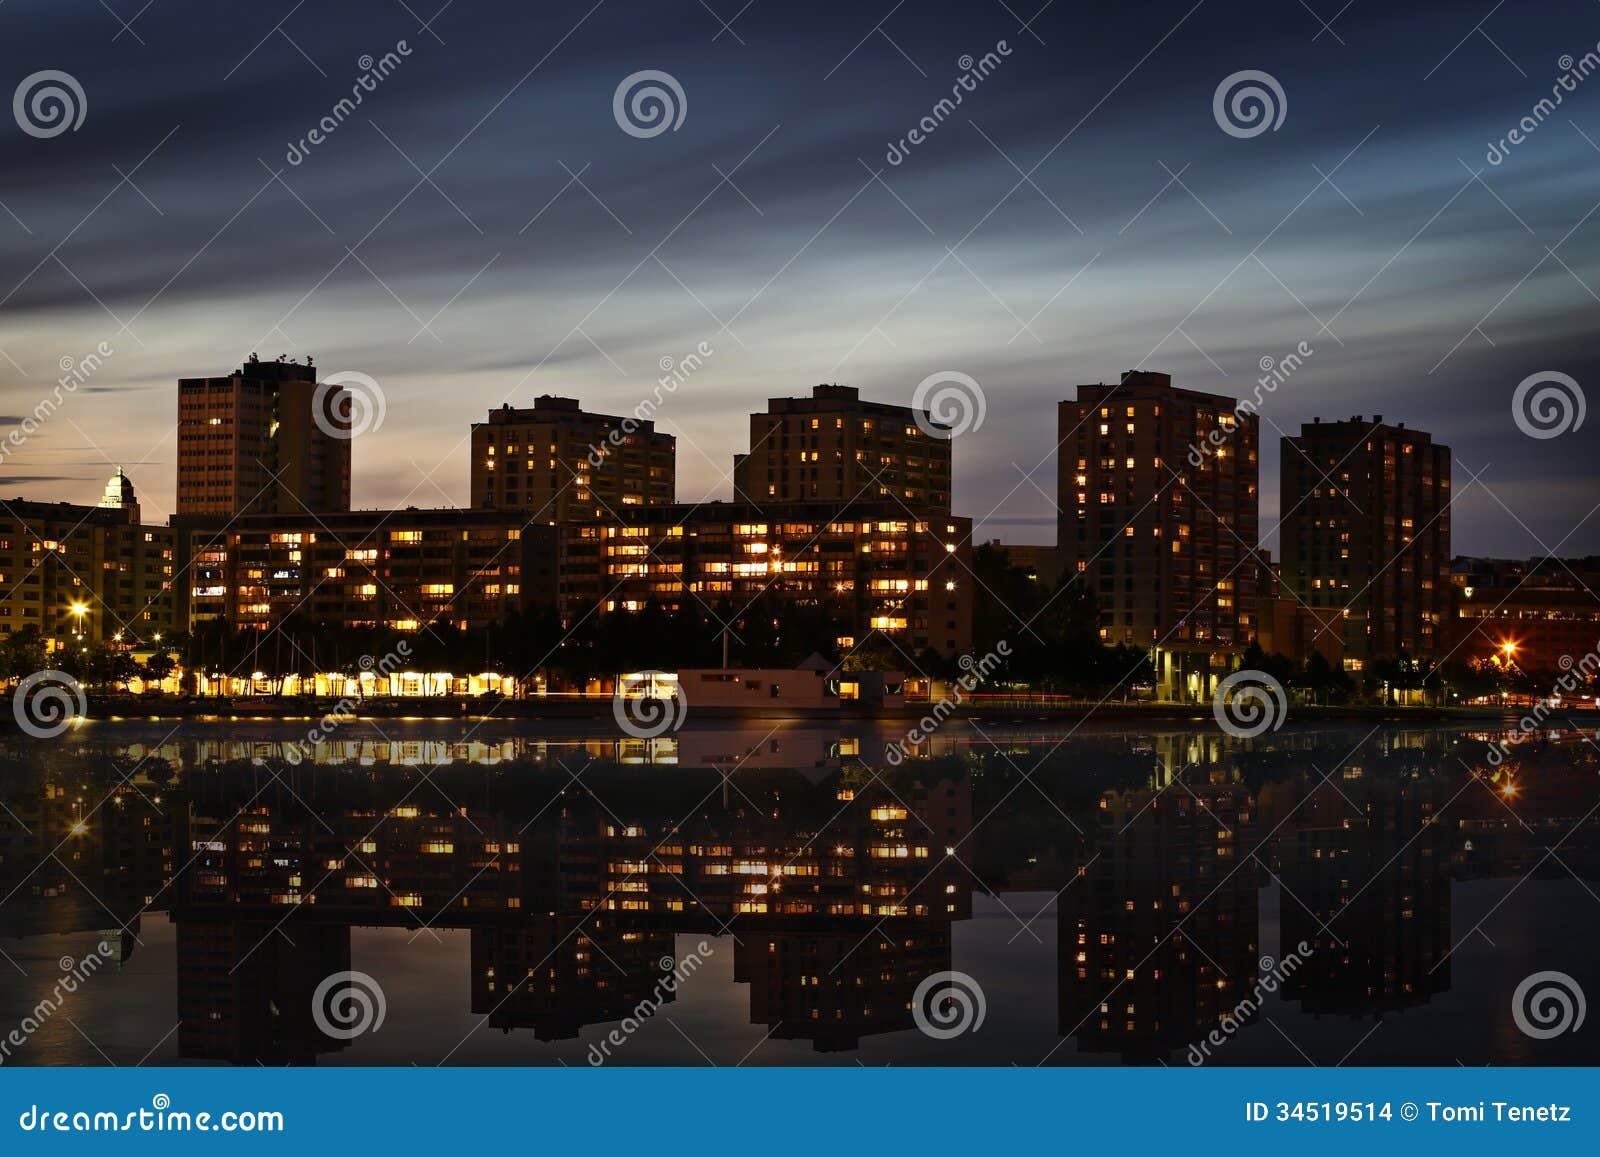 Fnland: District In Helsinki Stock Images - Image: 34519514